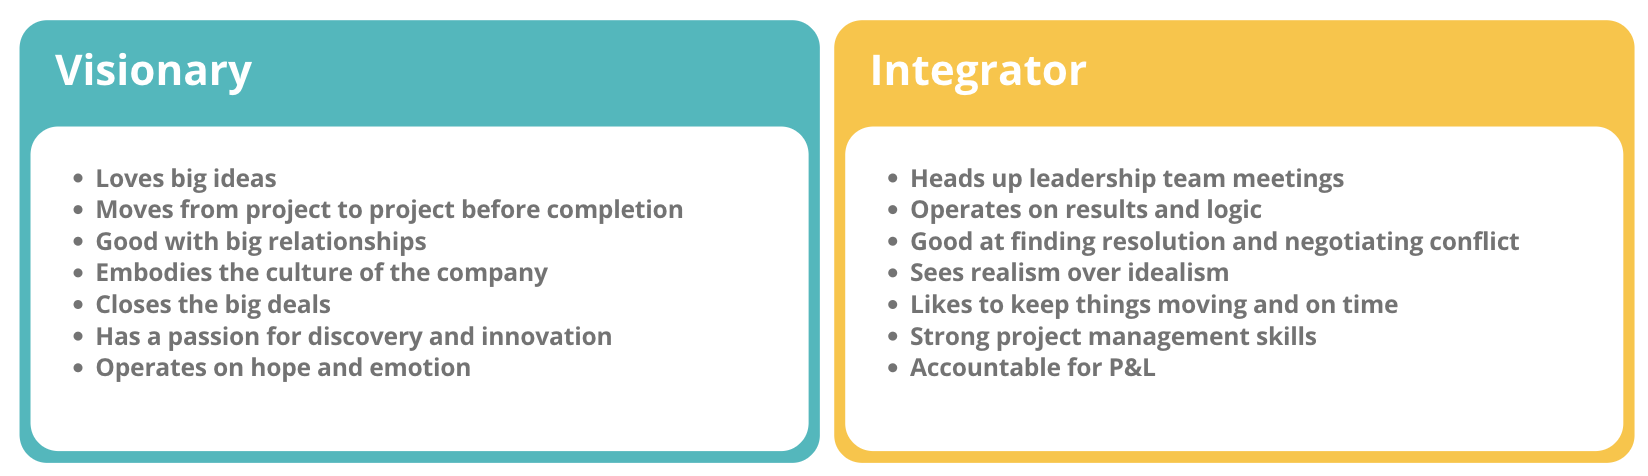 Visionar Vs. Integrator